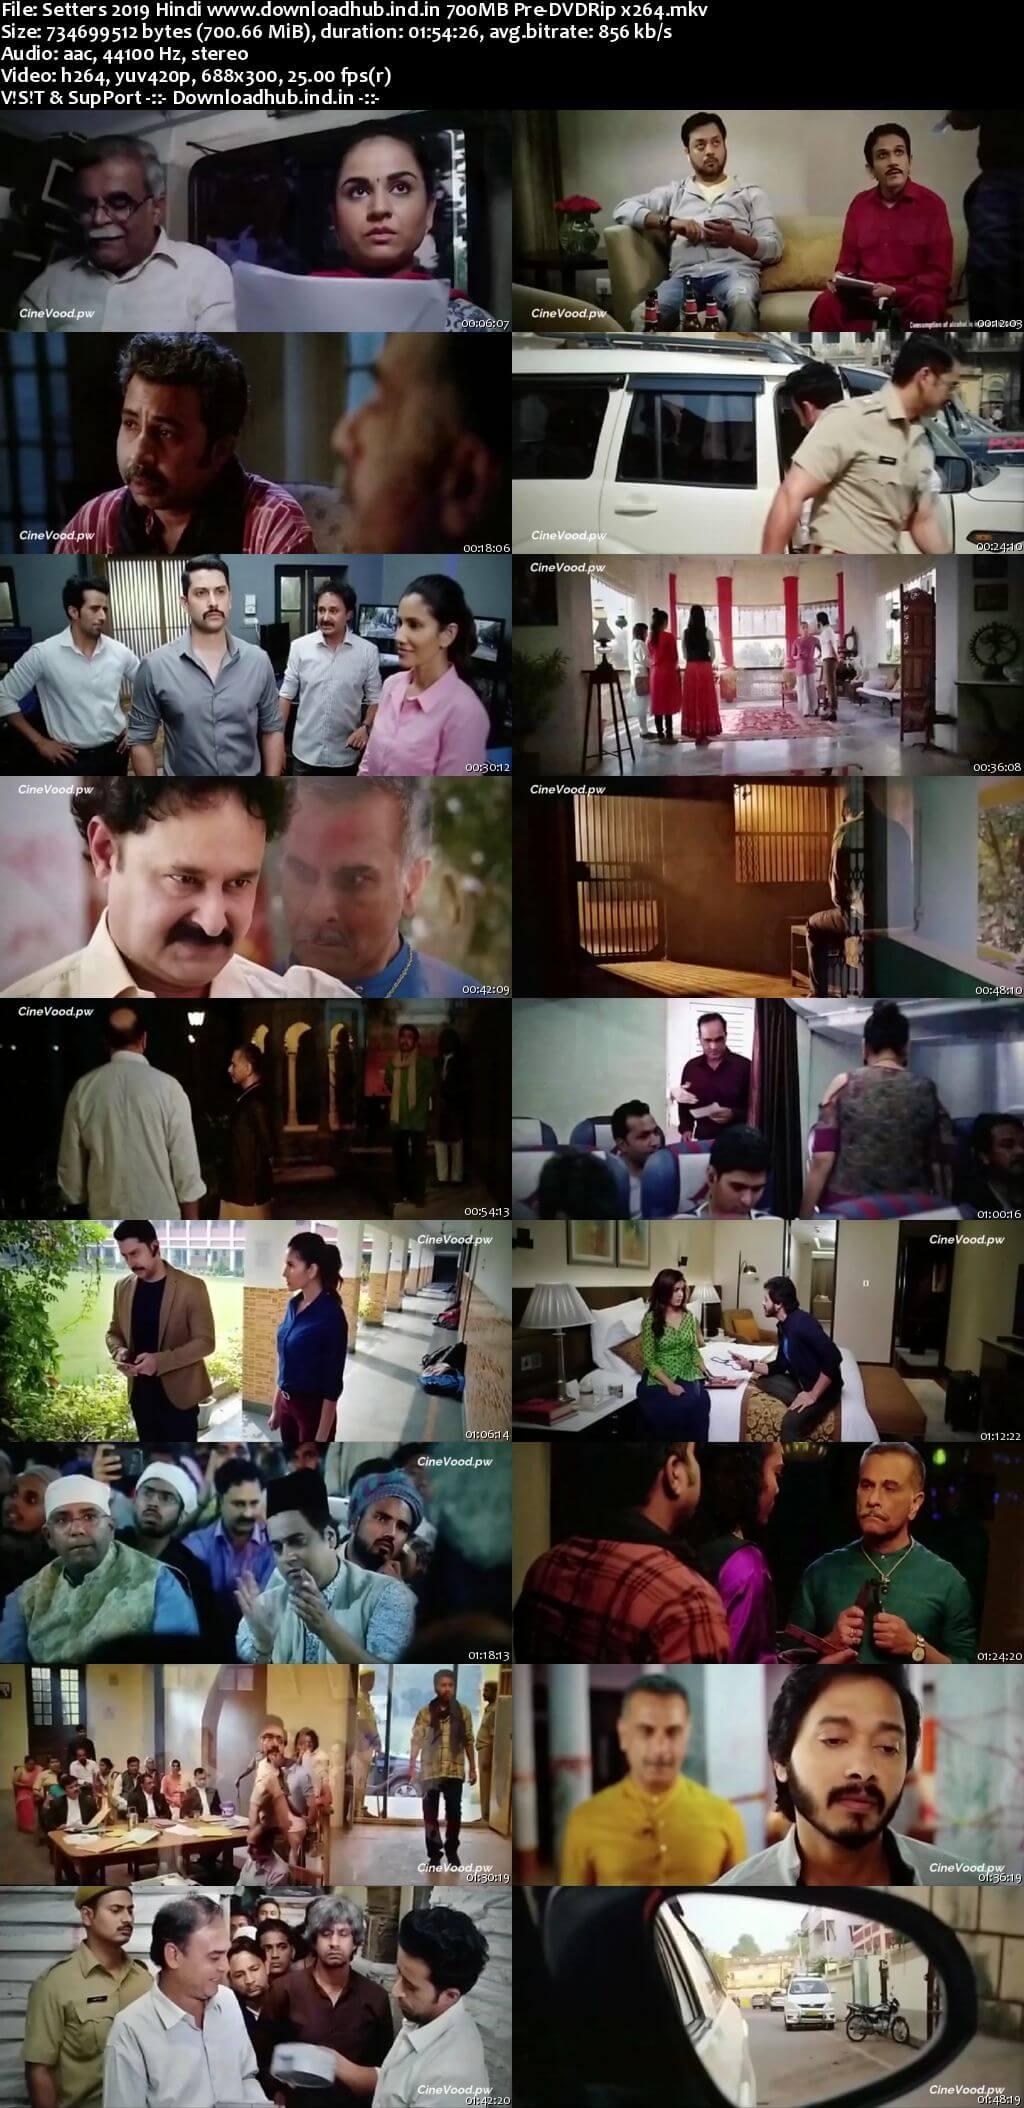 Setters 2019 Hindi 700MB Pre-DVDRip x264